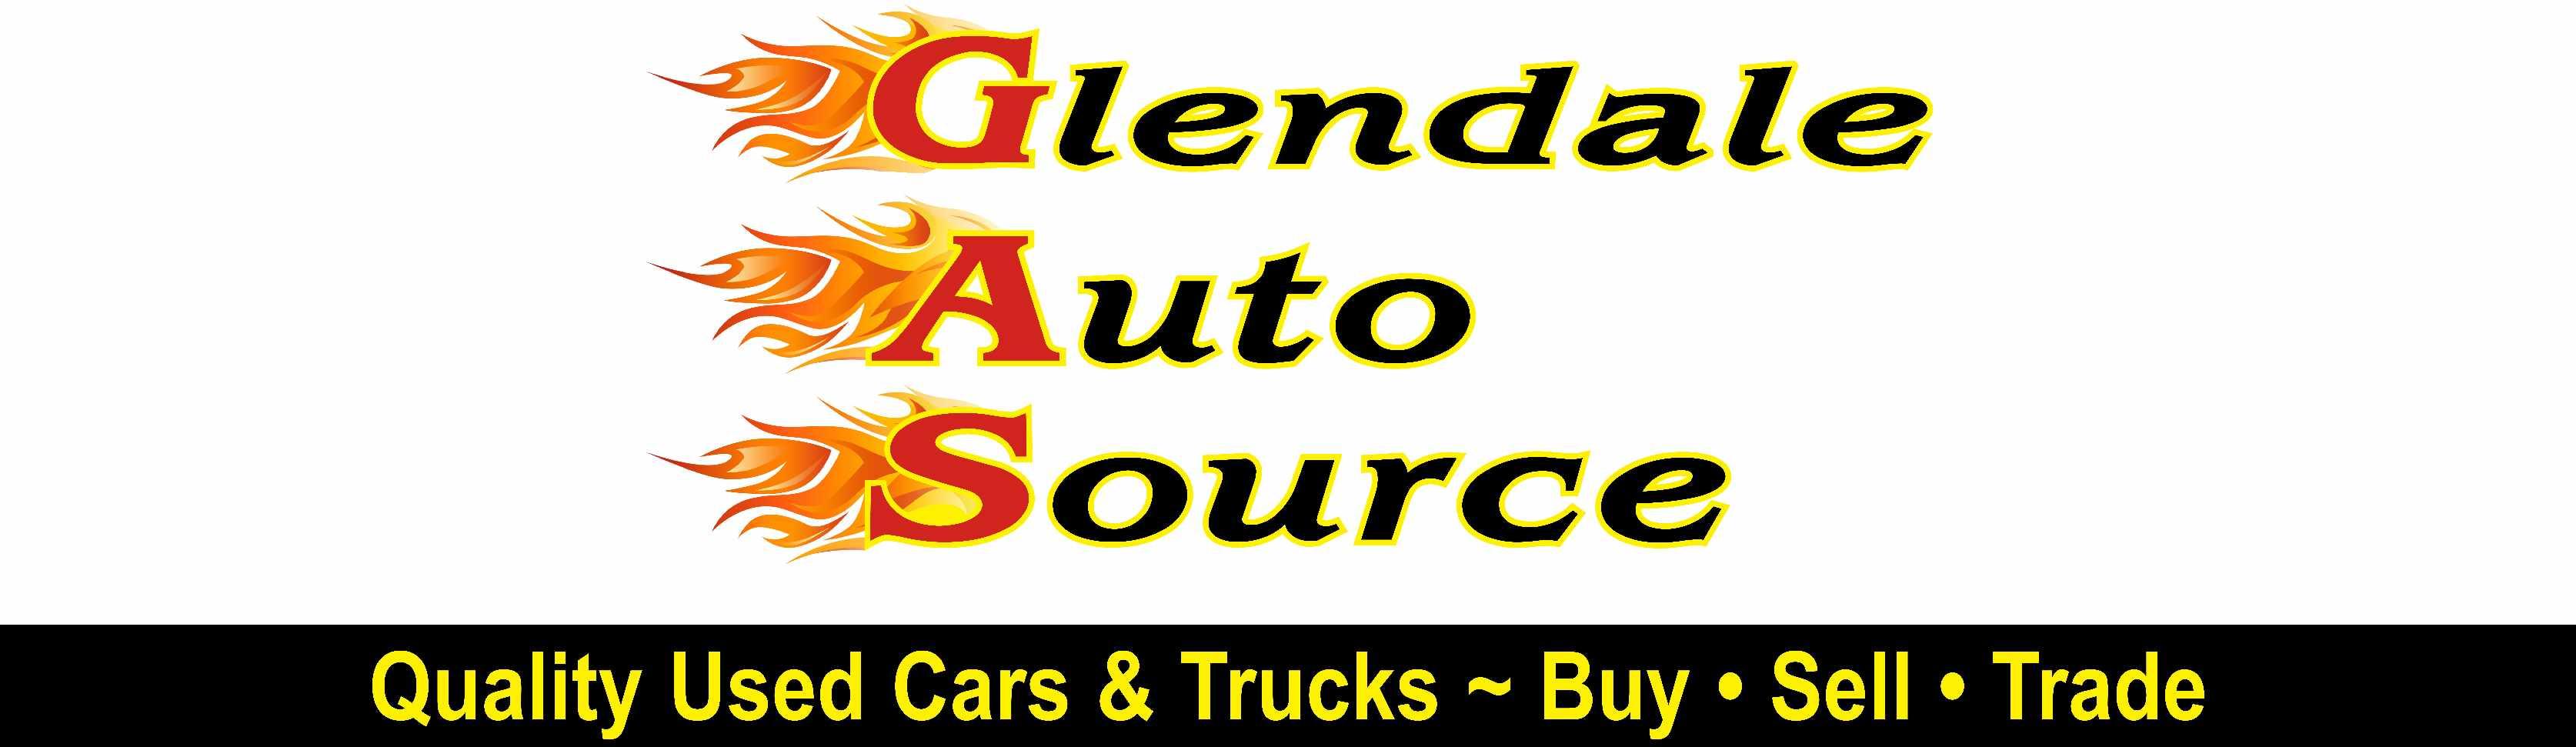 Glendale Auto Source – Glendale, AZ 85301 Used car and Trucks